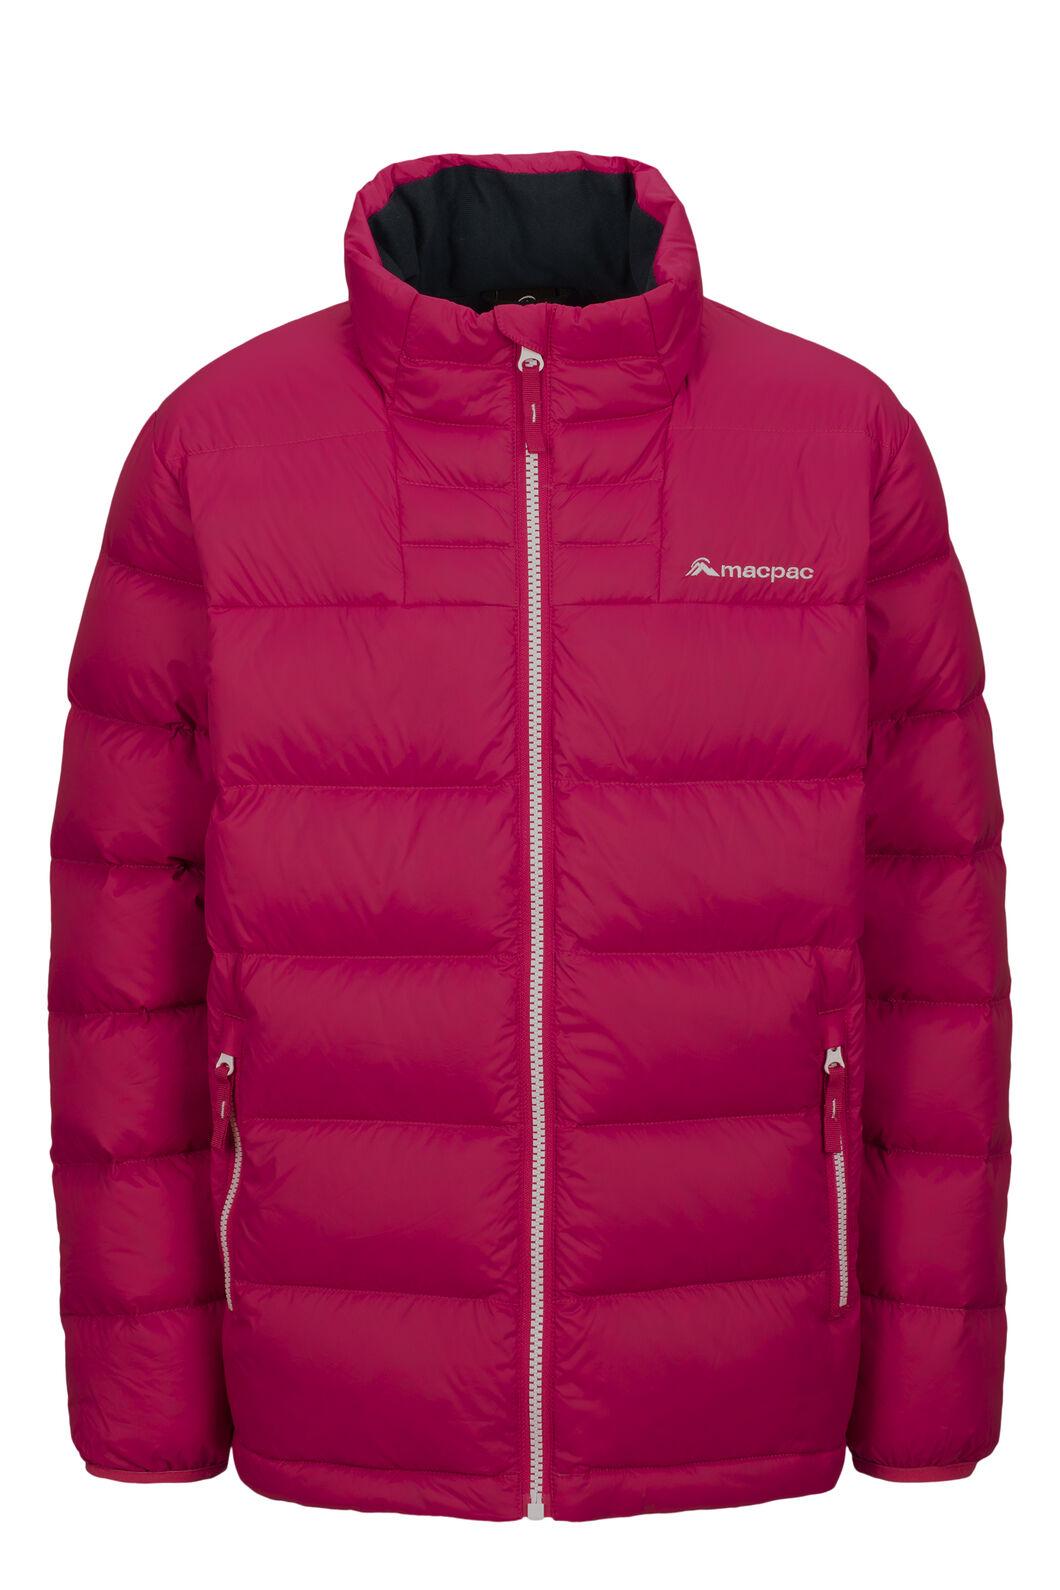 Macpac Atom Down Jacket — Kids', Raspberry Wine, hi-res